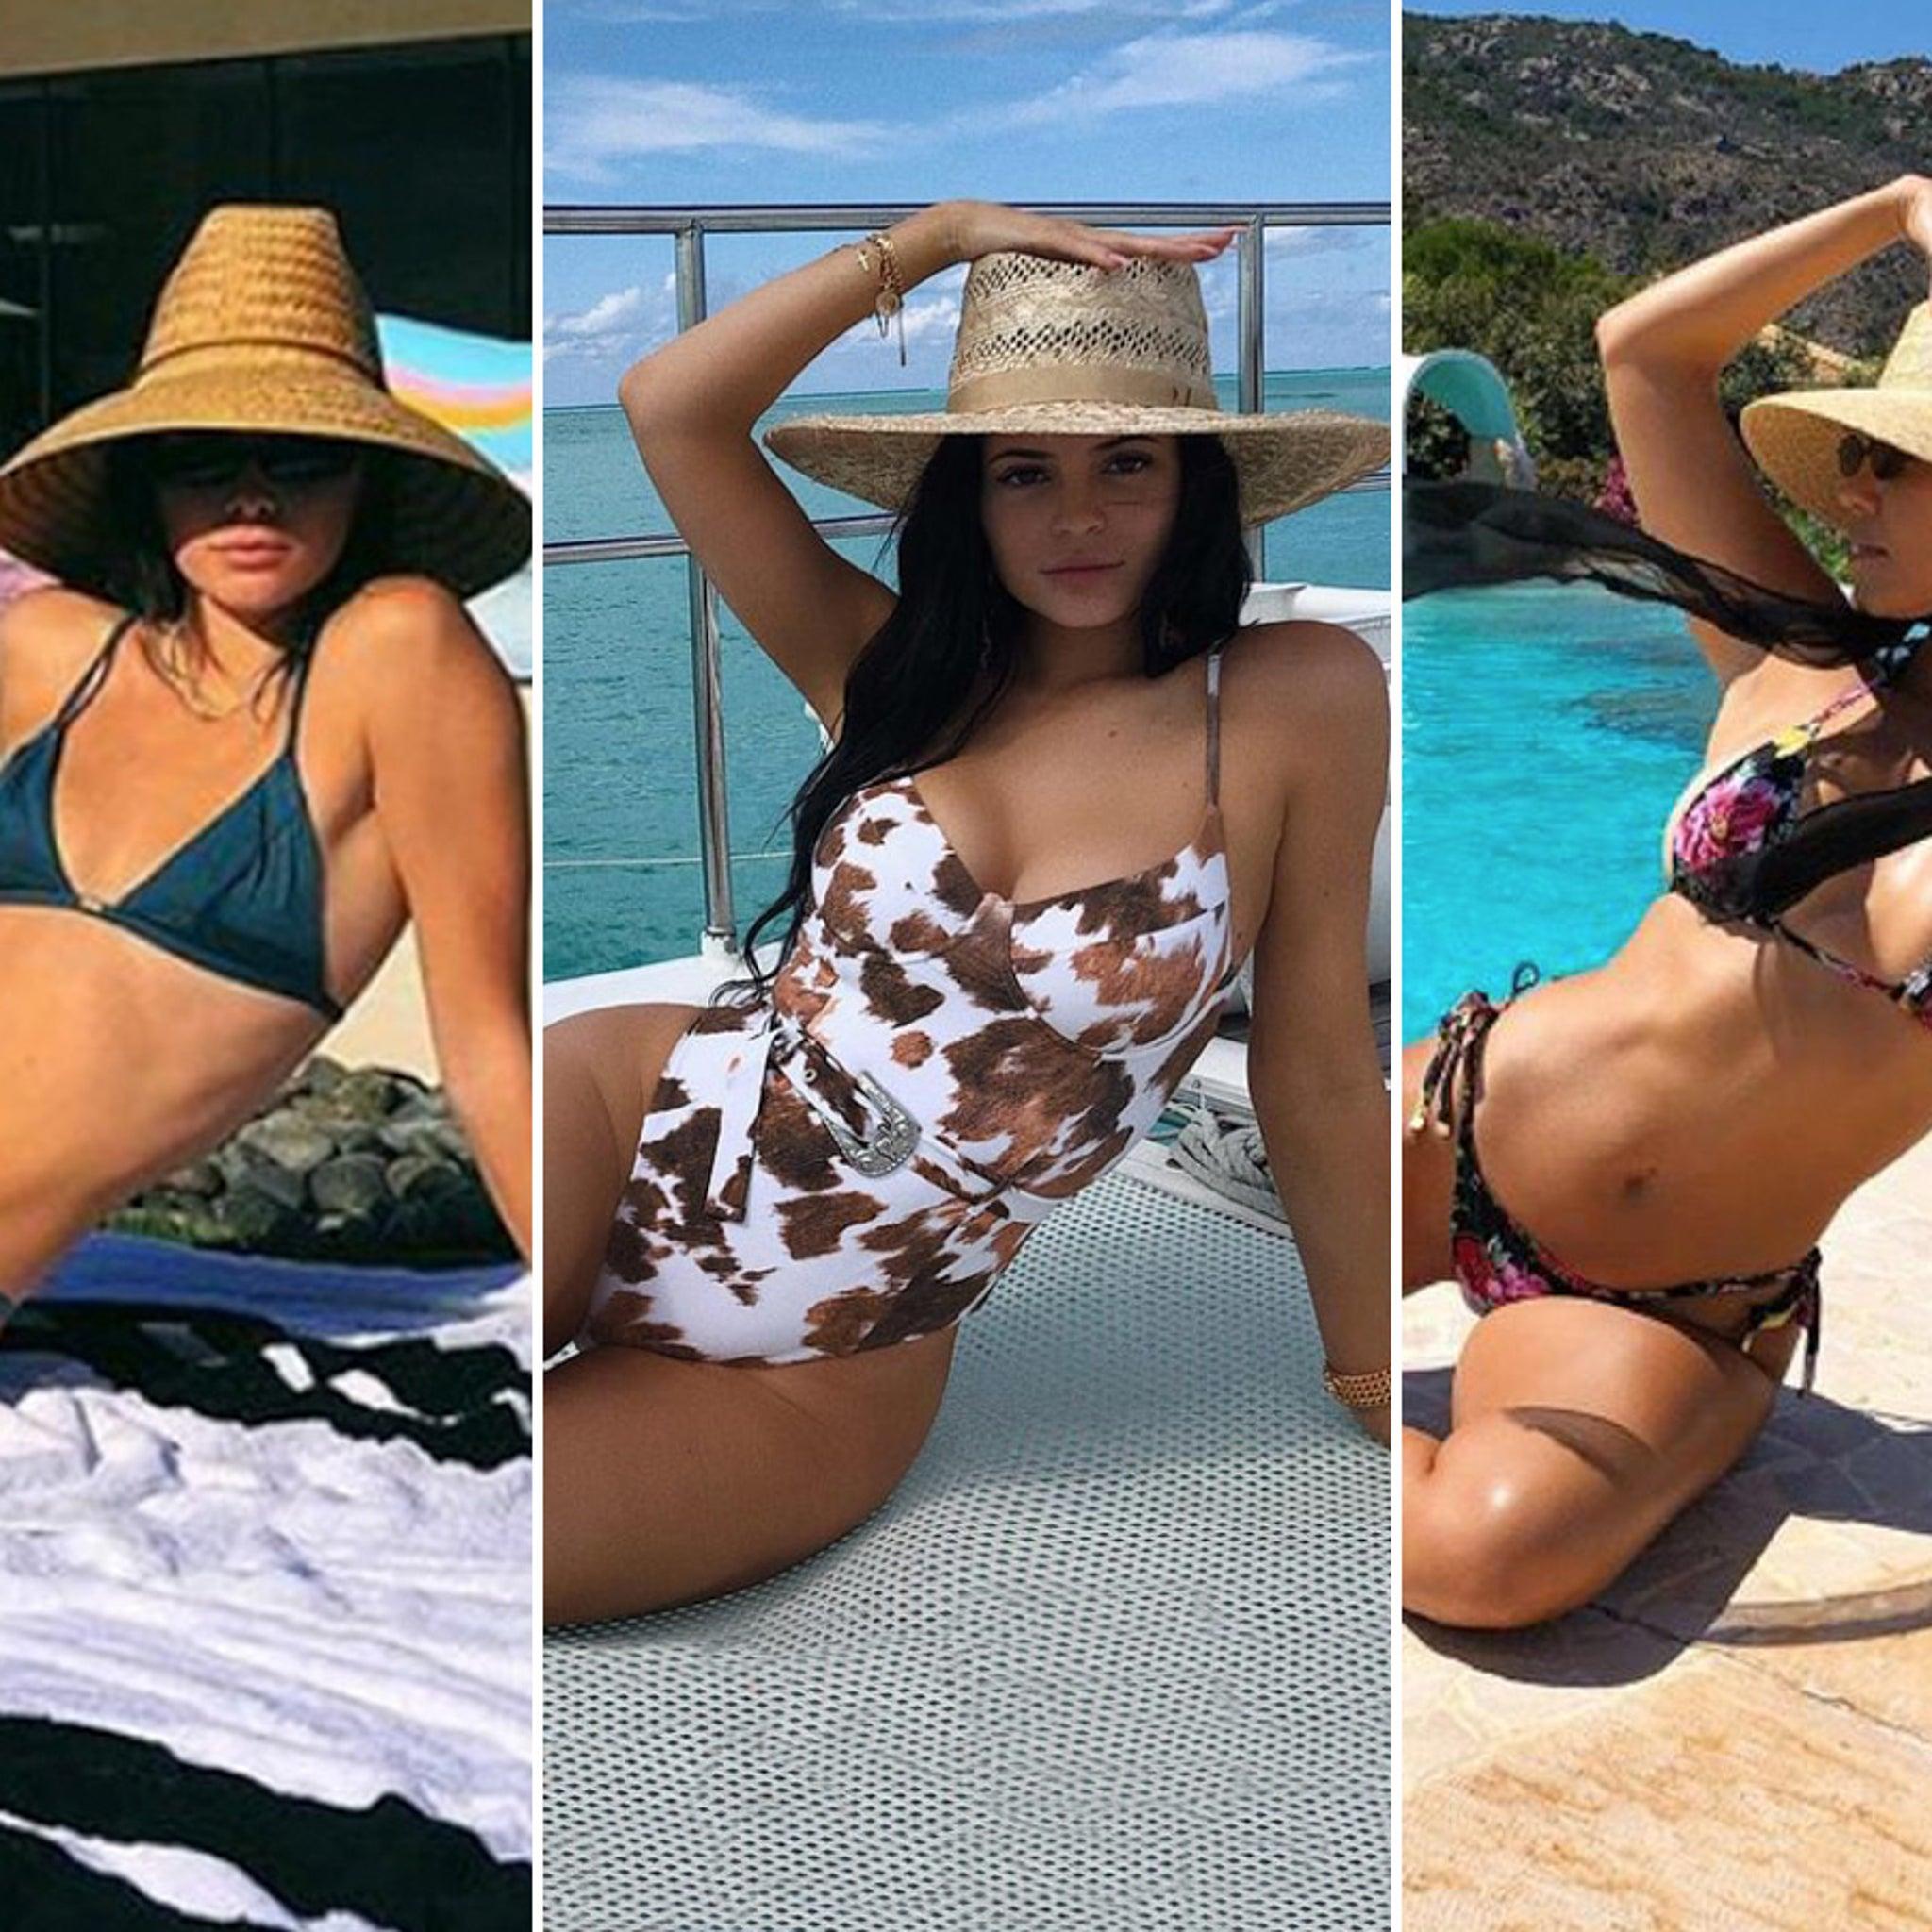 The Kardashians -- Who'd You Rather?!